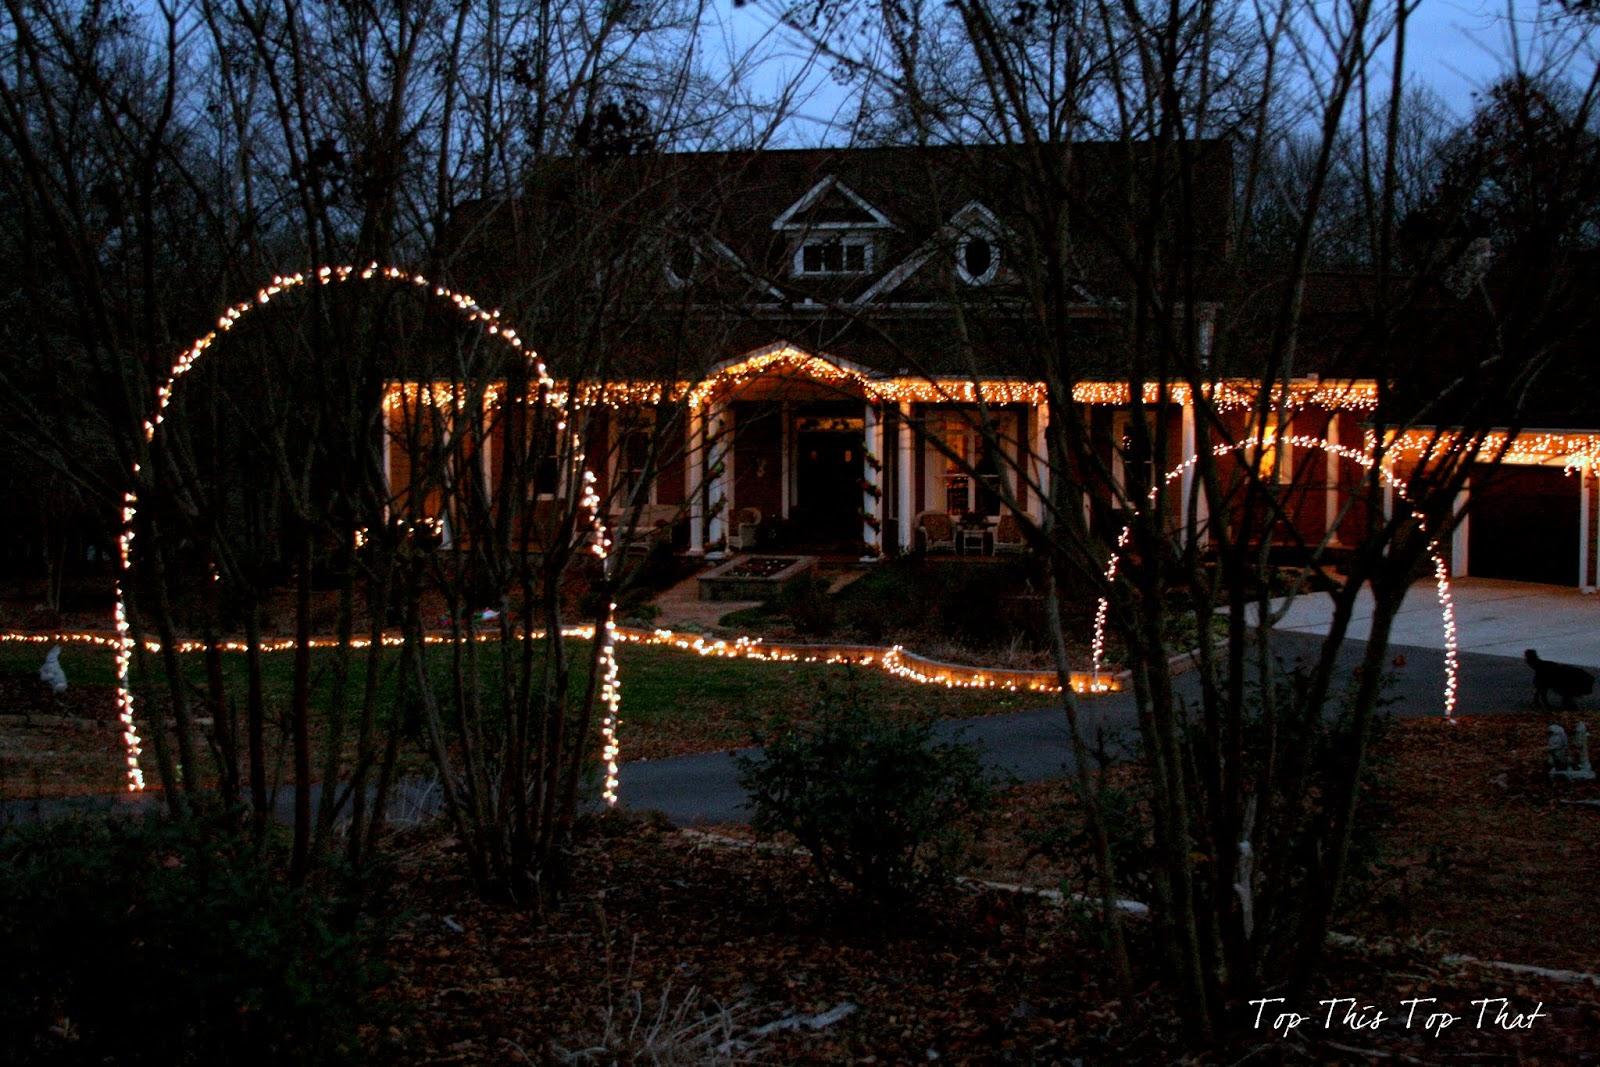 Outdoor Christmas Lights - Duke Manor Farm